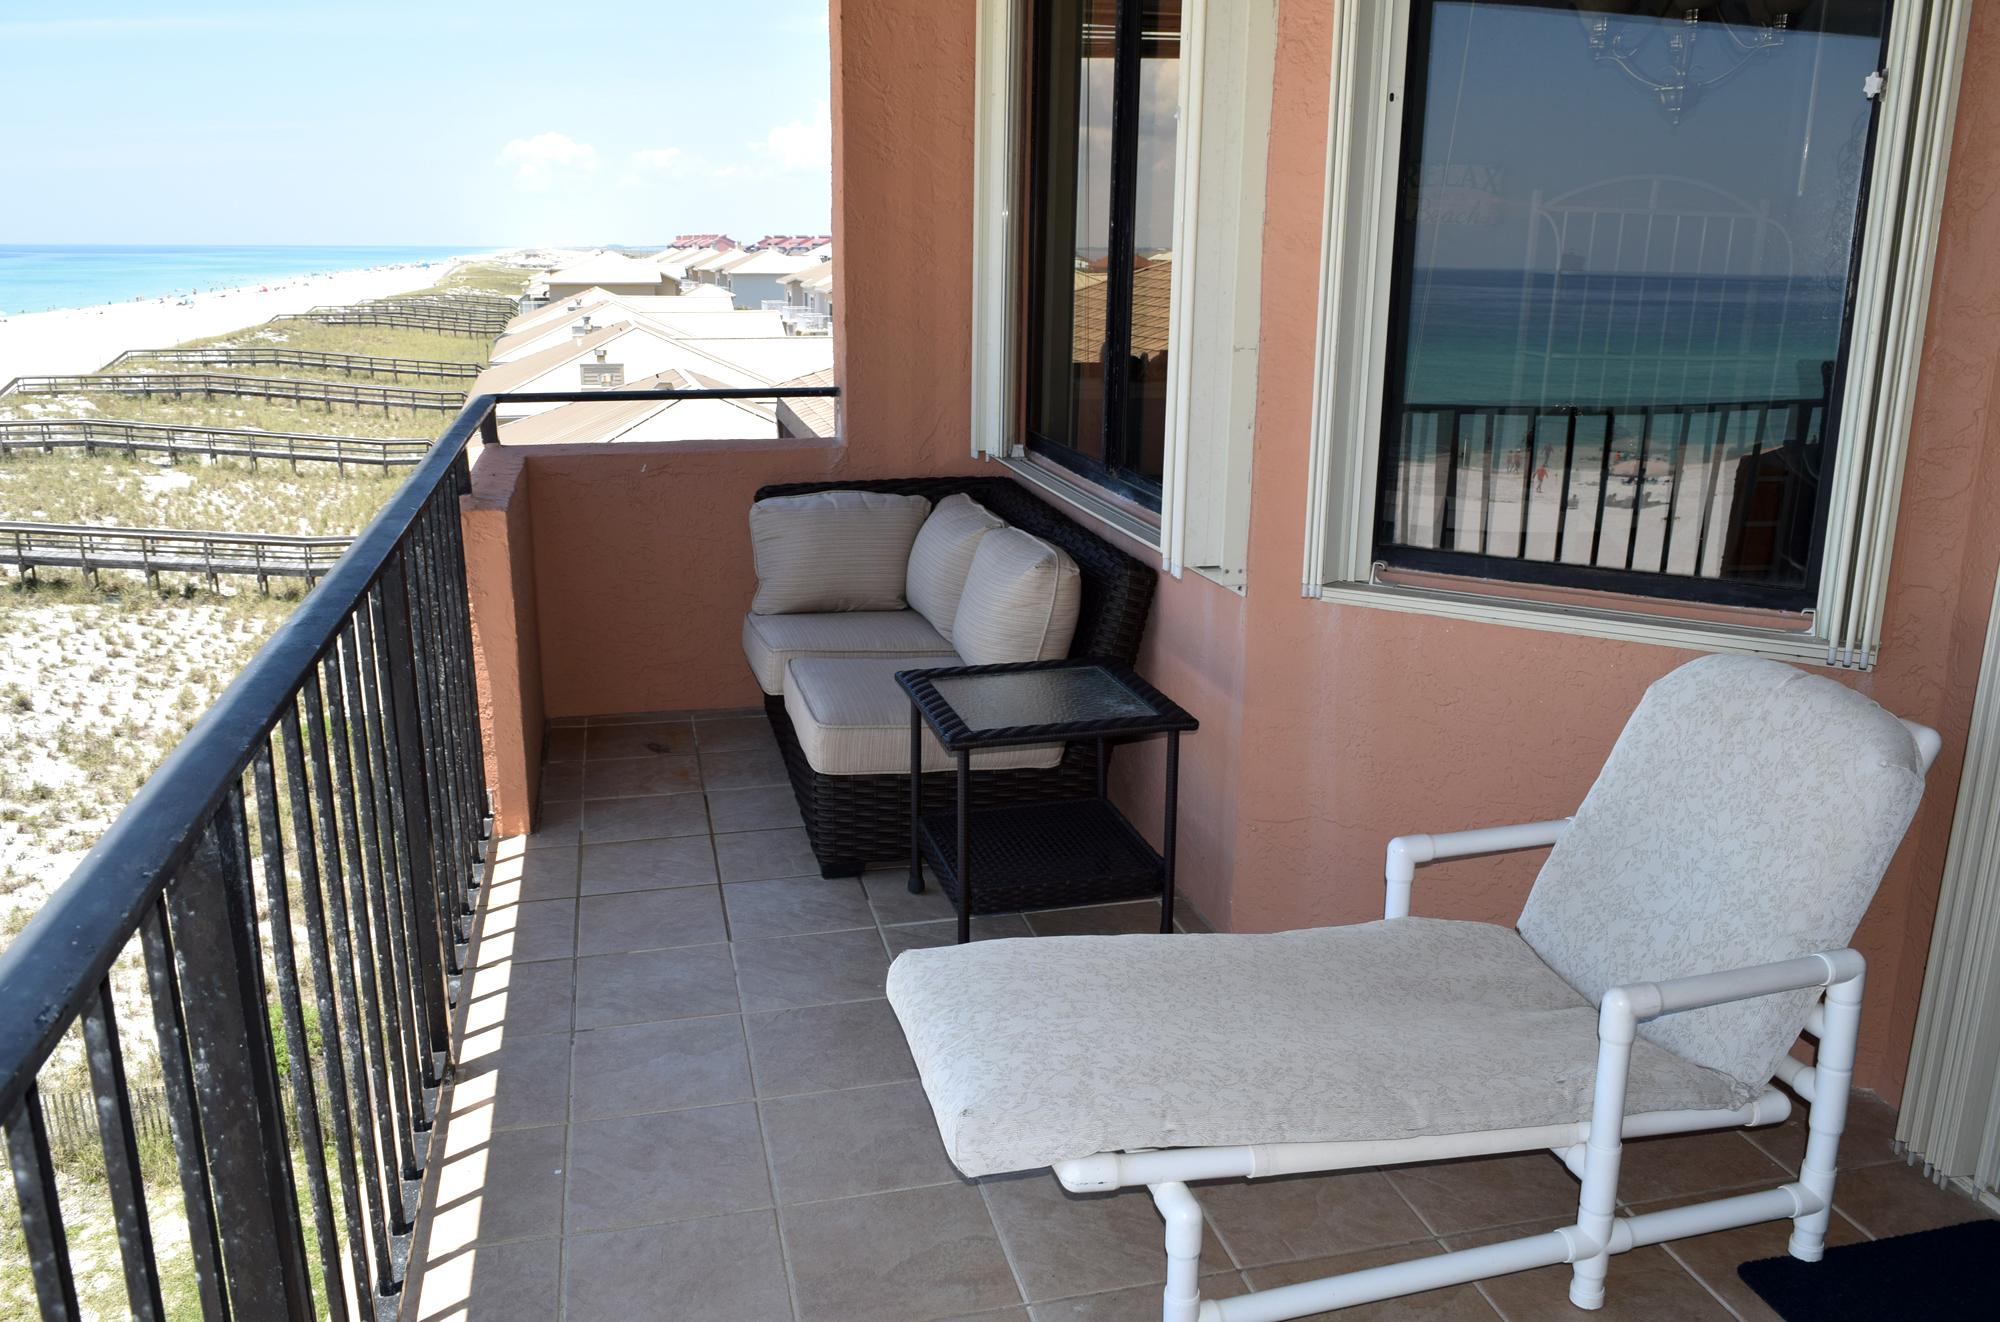 Gulf Winds #404 Condo rental in Gulf Winds Pensacola ~ Pensacola Beach Vacation Rentals by BeachGuide in Pensacola Beach Florida - #21